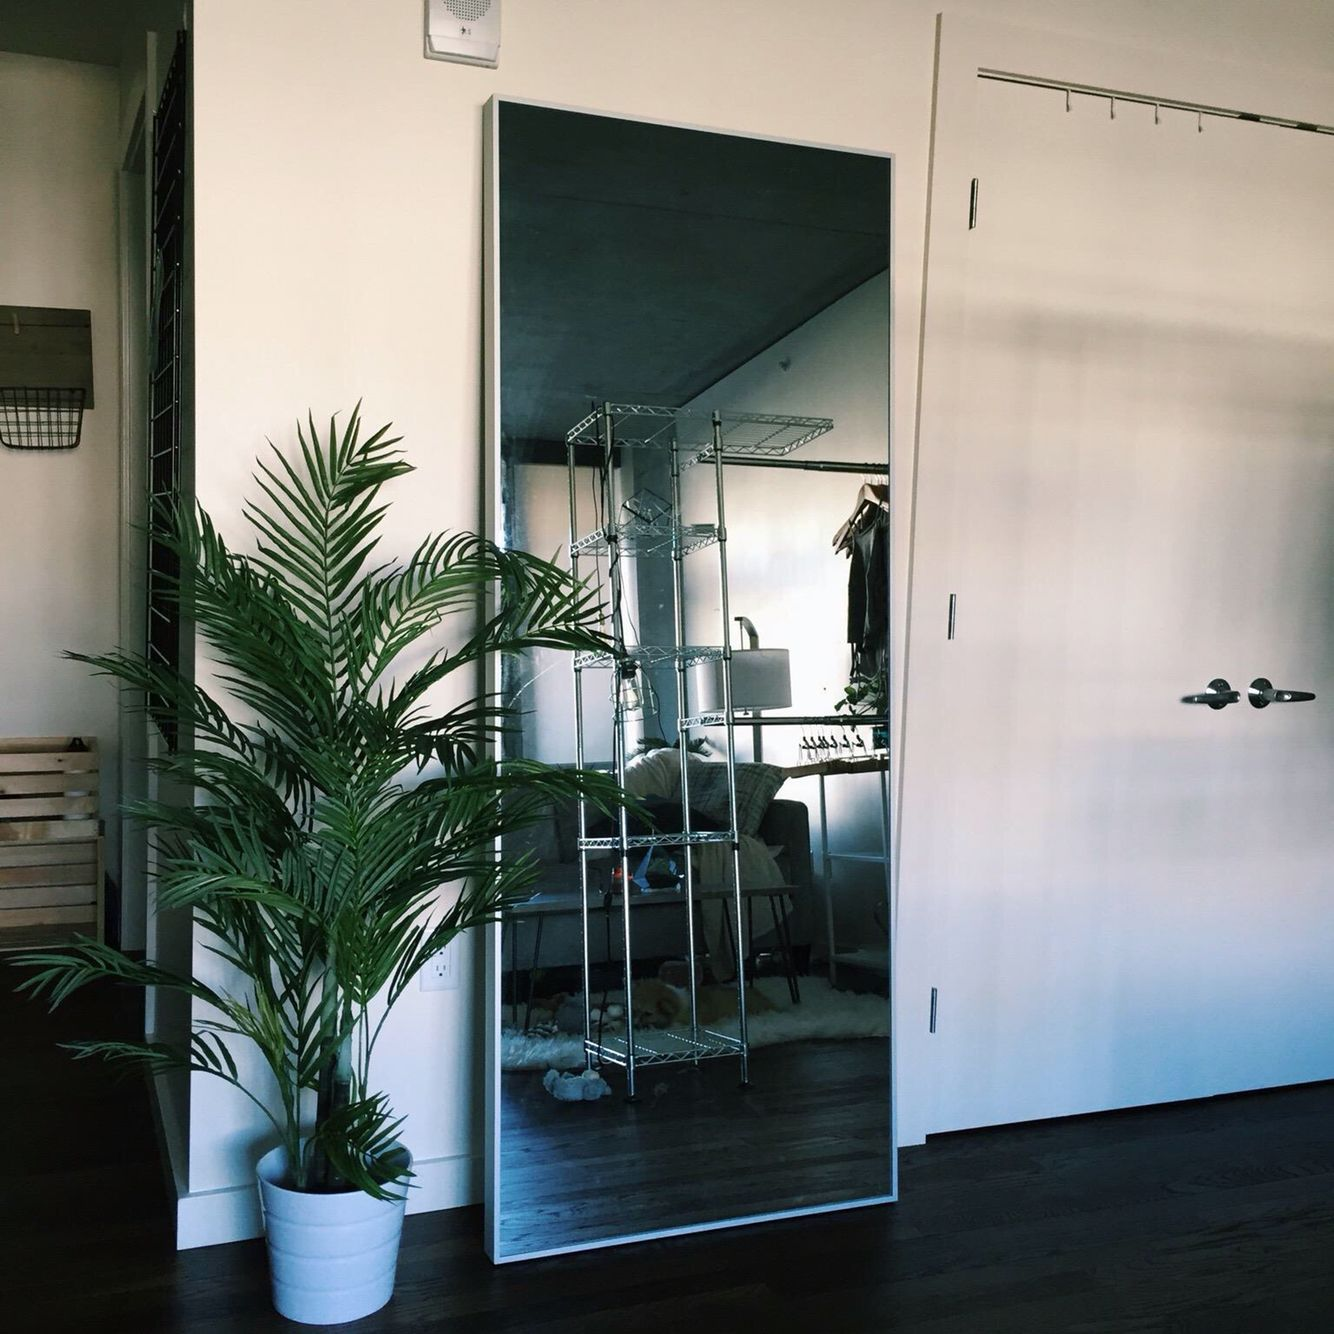 Ikea mirror party decor pinterest espejo interiores for Decoracion espejos ikea